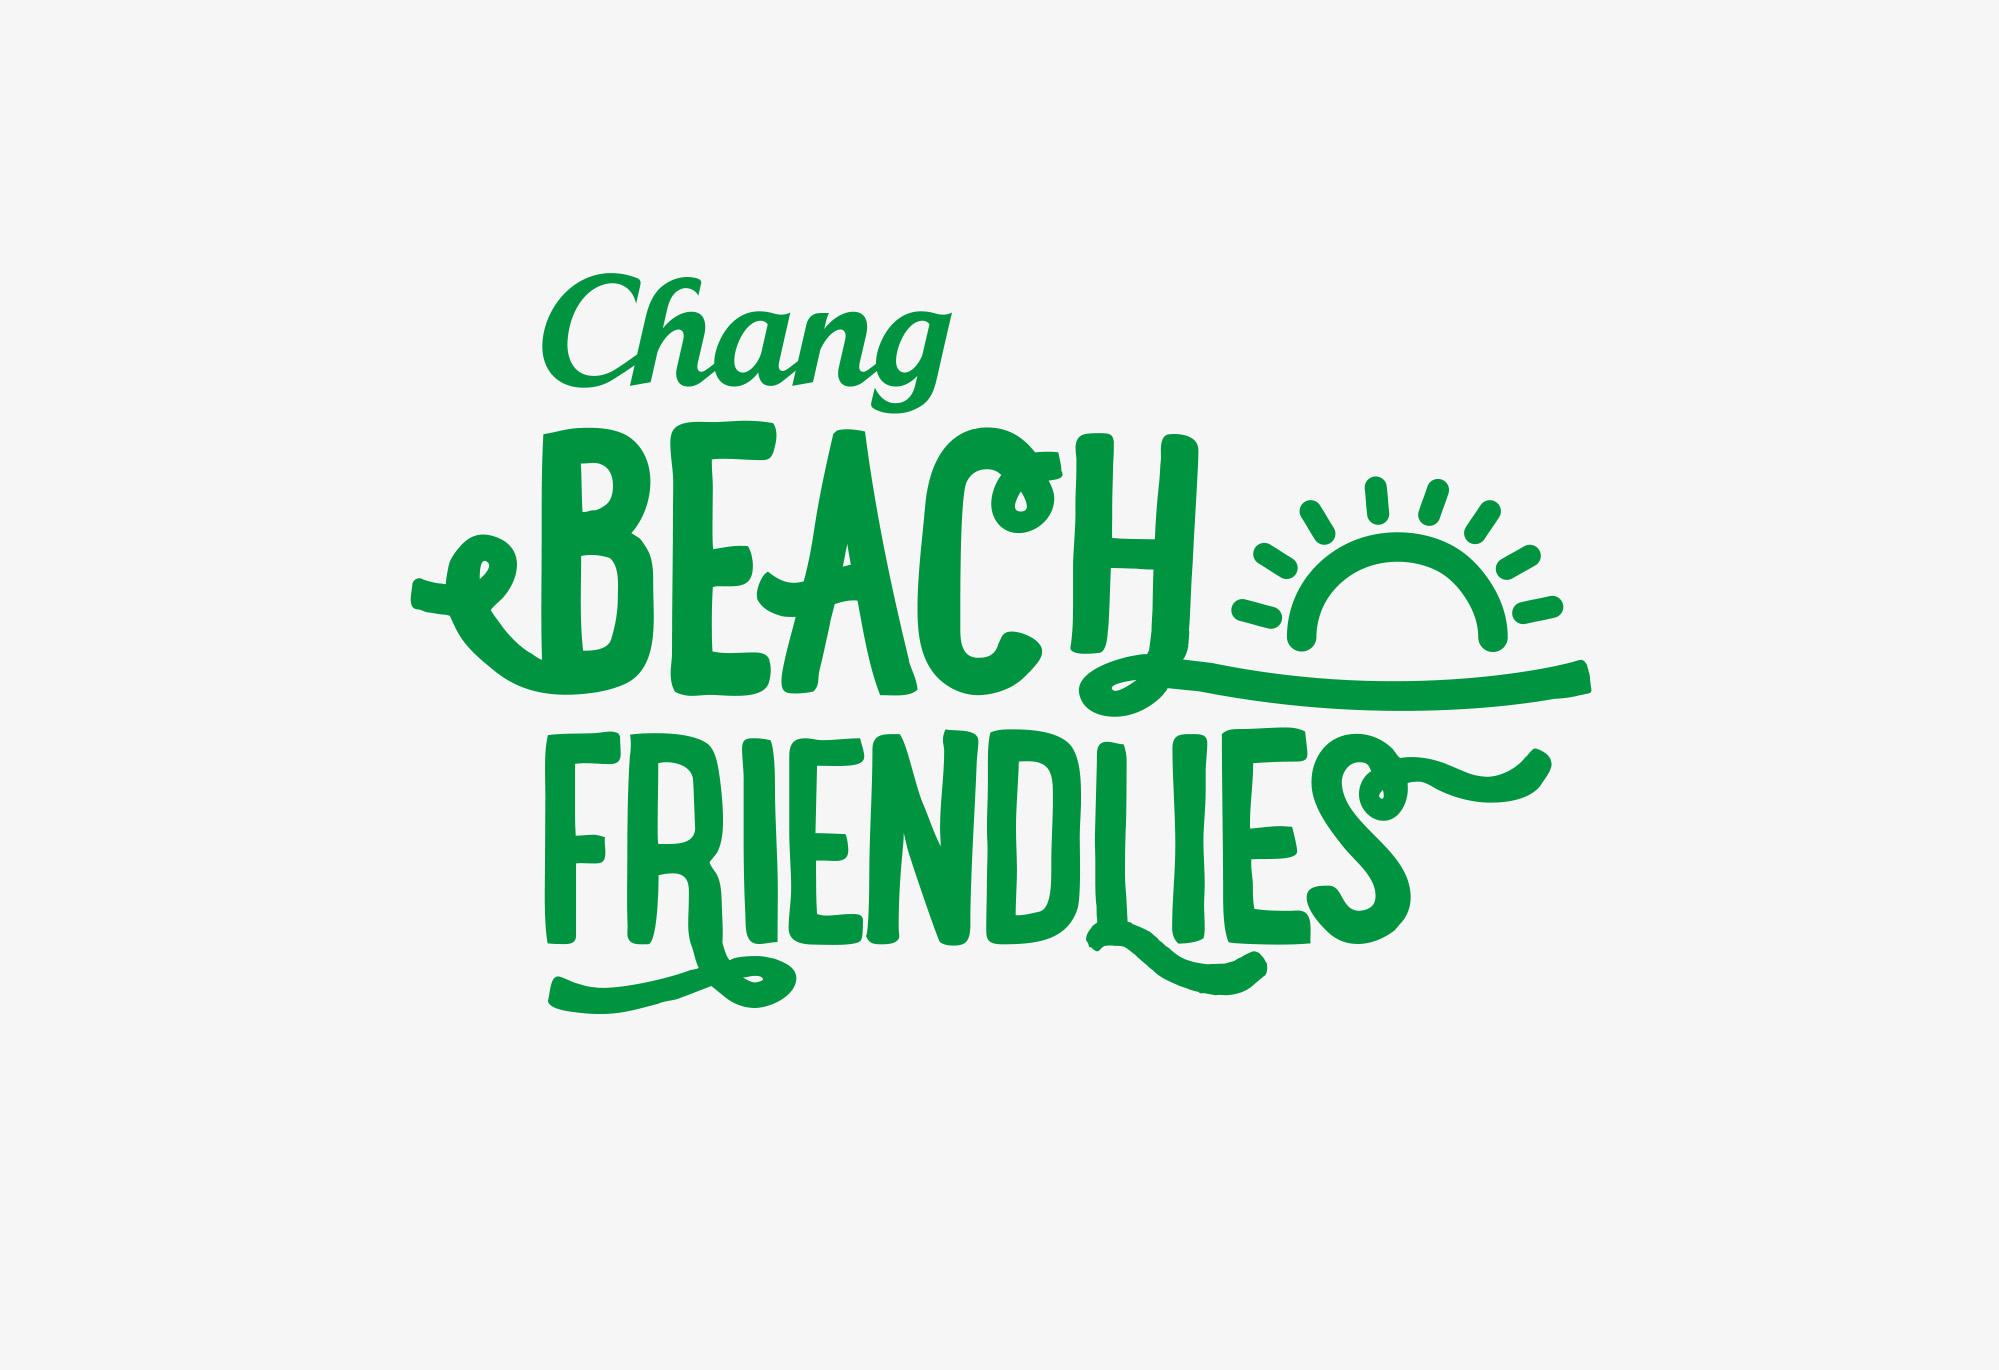 Chang Beach Friendlies logo